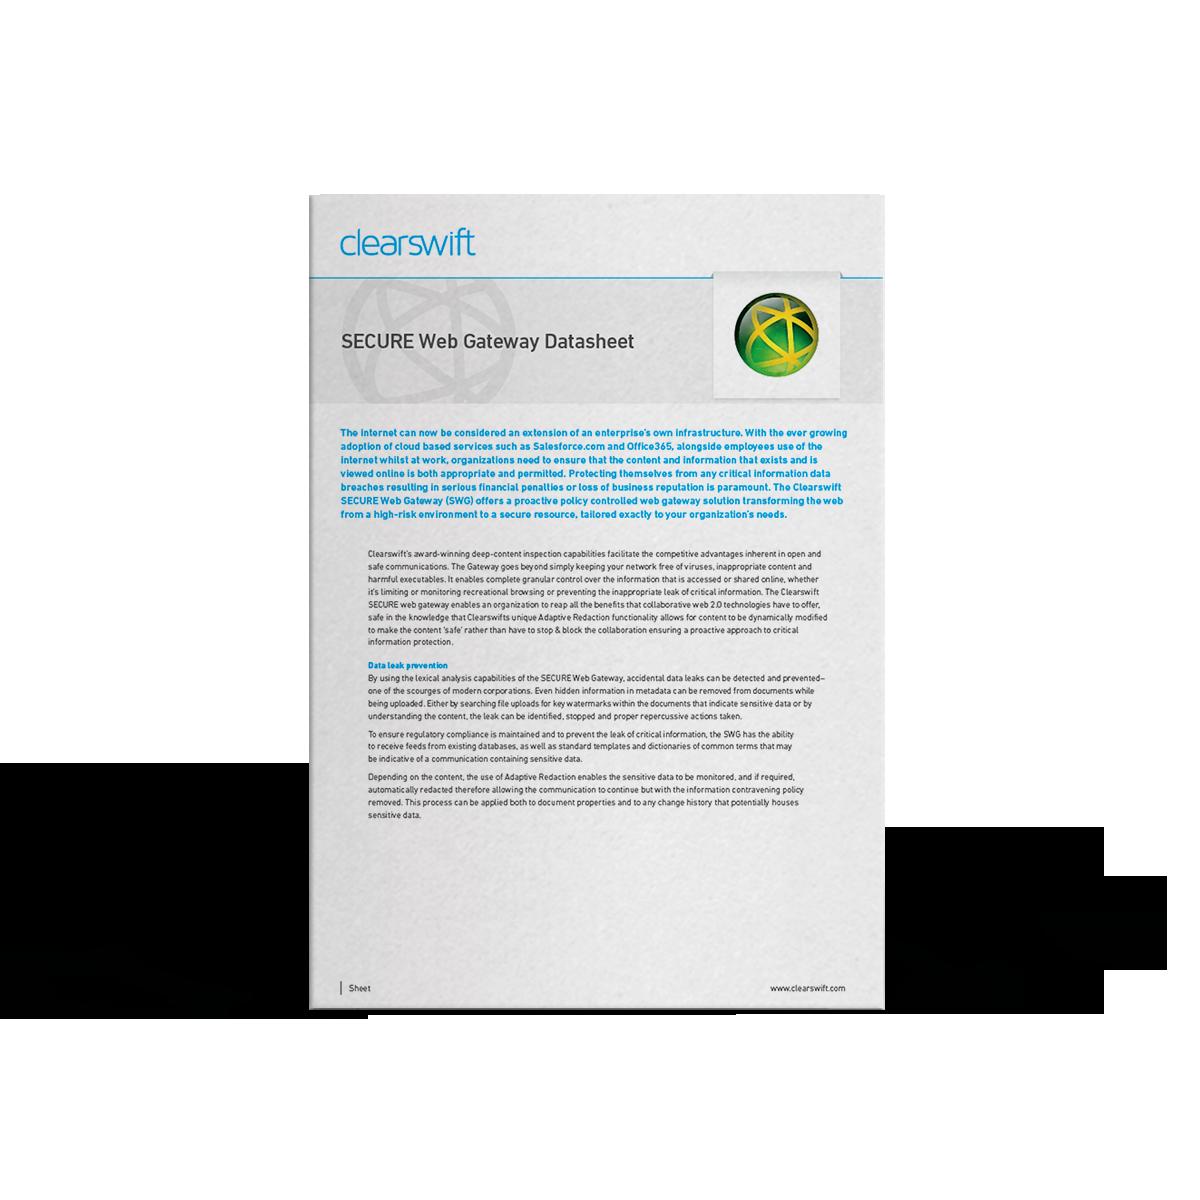 Clearswift SWG datasheet